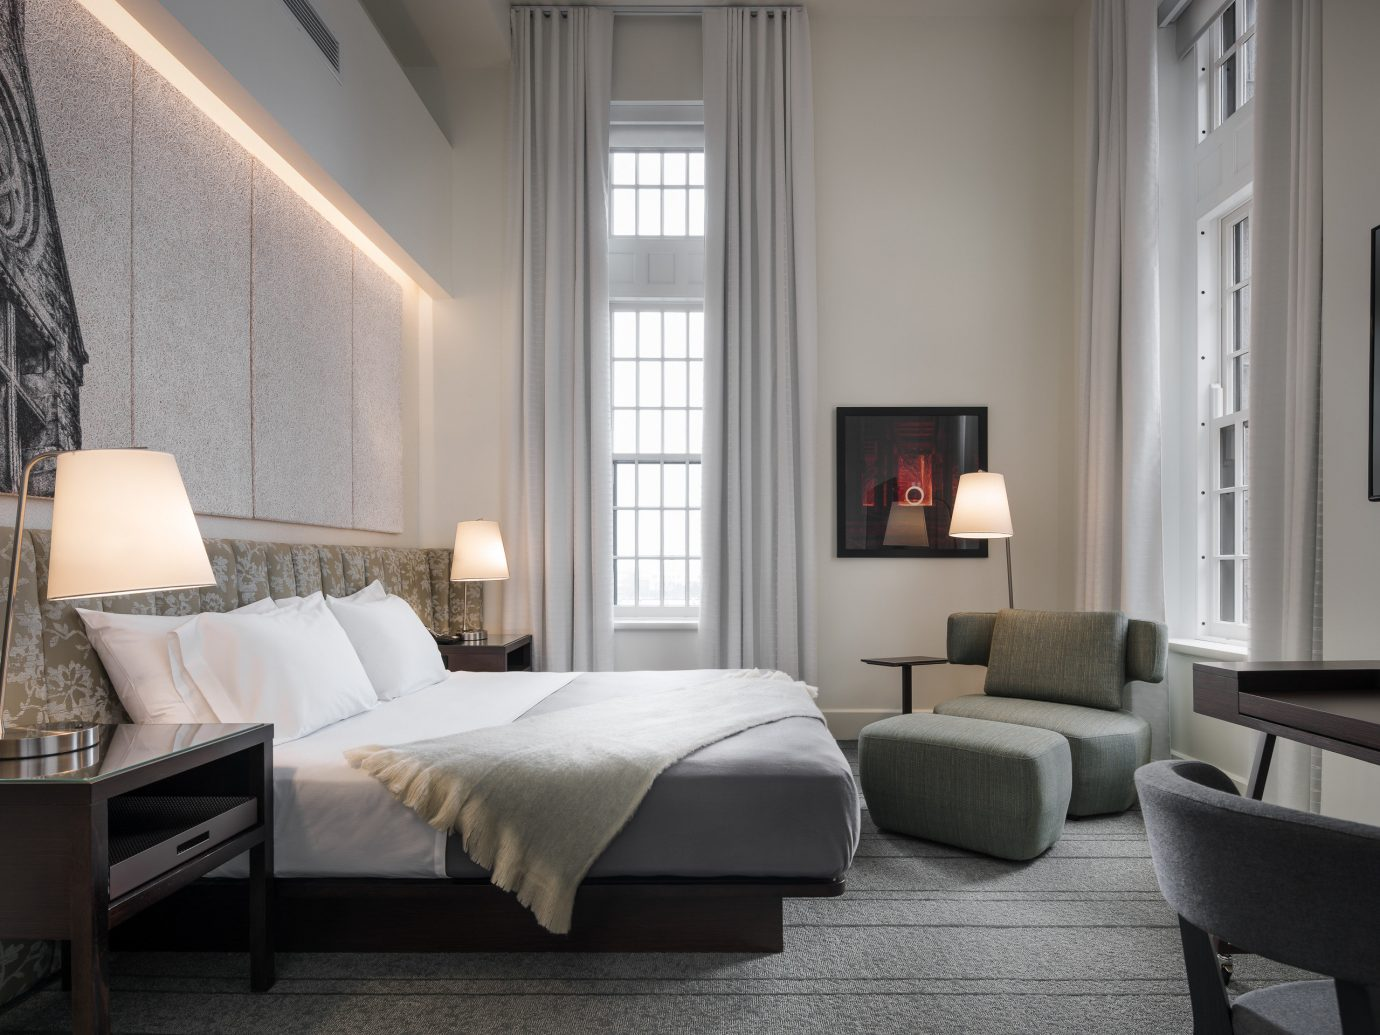 Trip Ideas indoor floor room wall window chair hotel interior design Living Suite bed frame ceiling furniture Bedroom interior designer living room bed flooring decorated